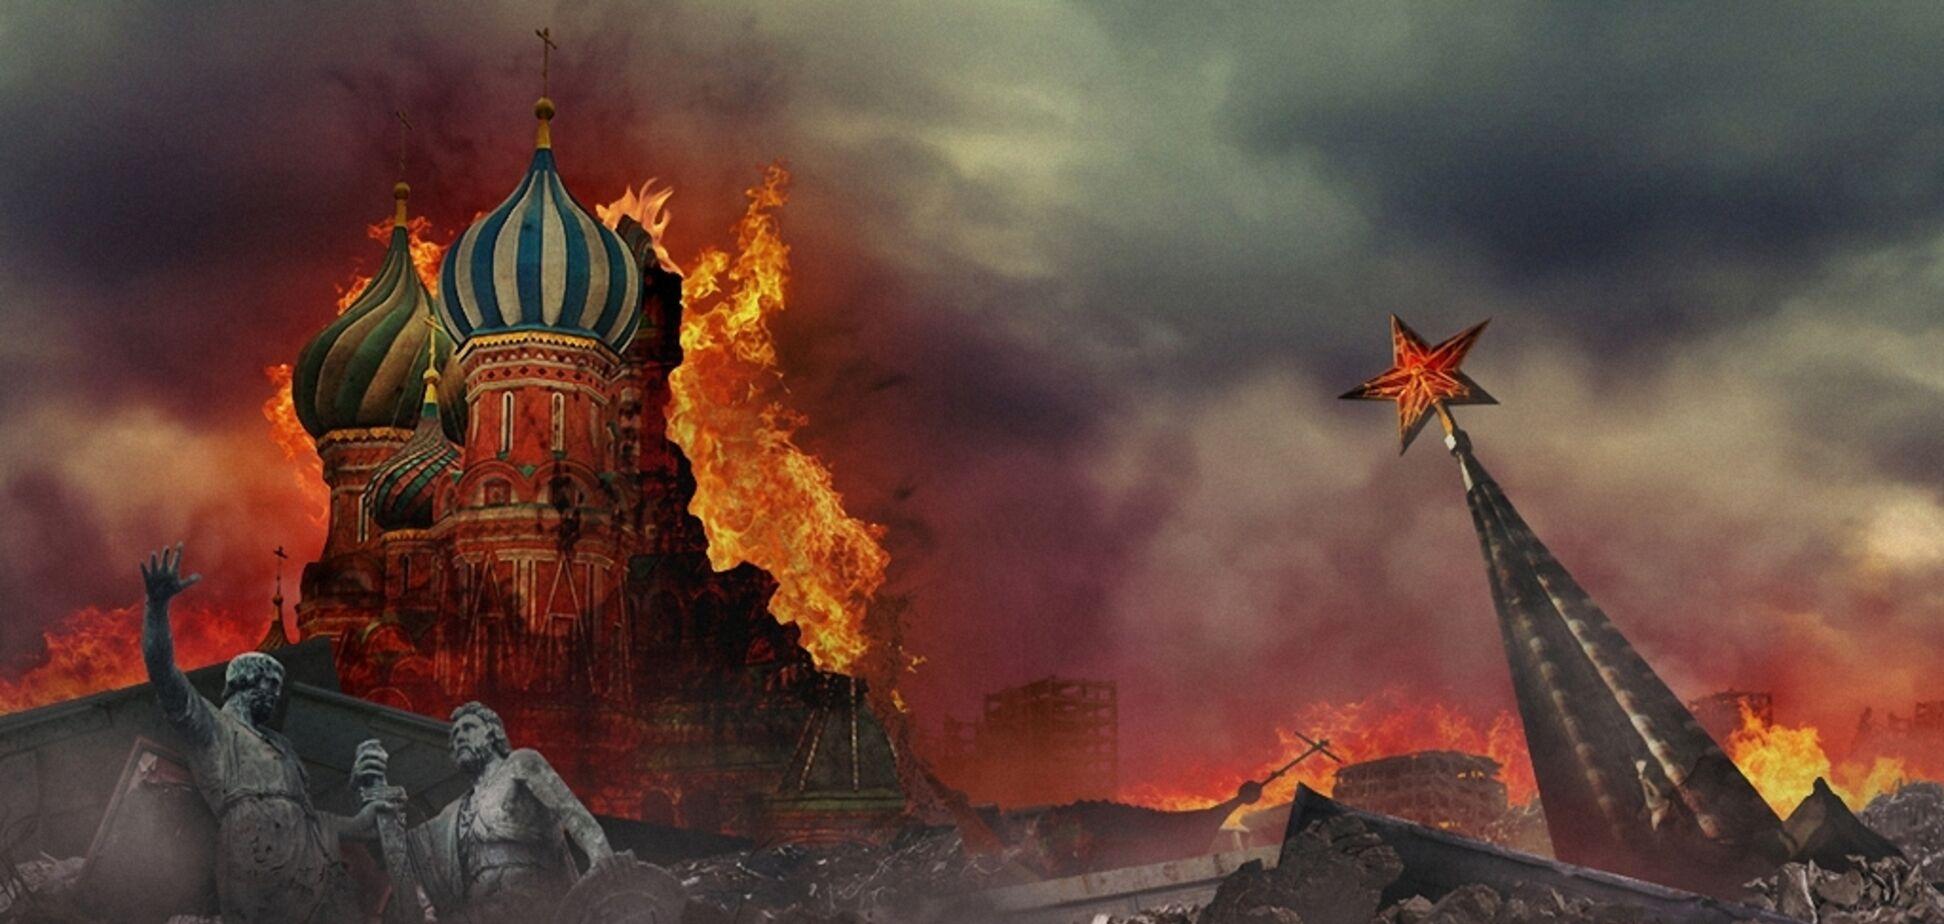 Путин помешался на Украине. Призрак Майдана приходит к нему по ночам